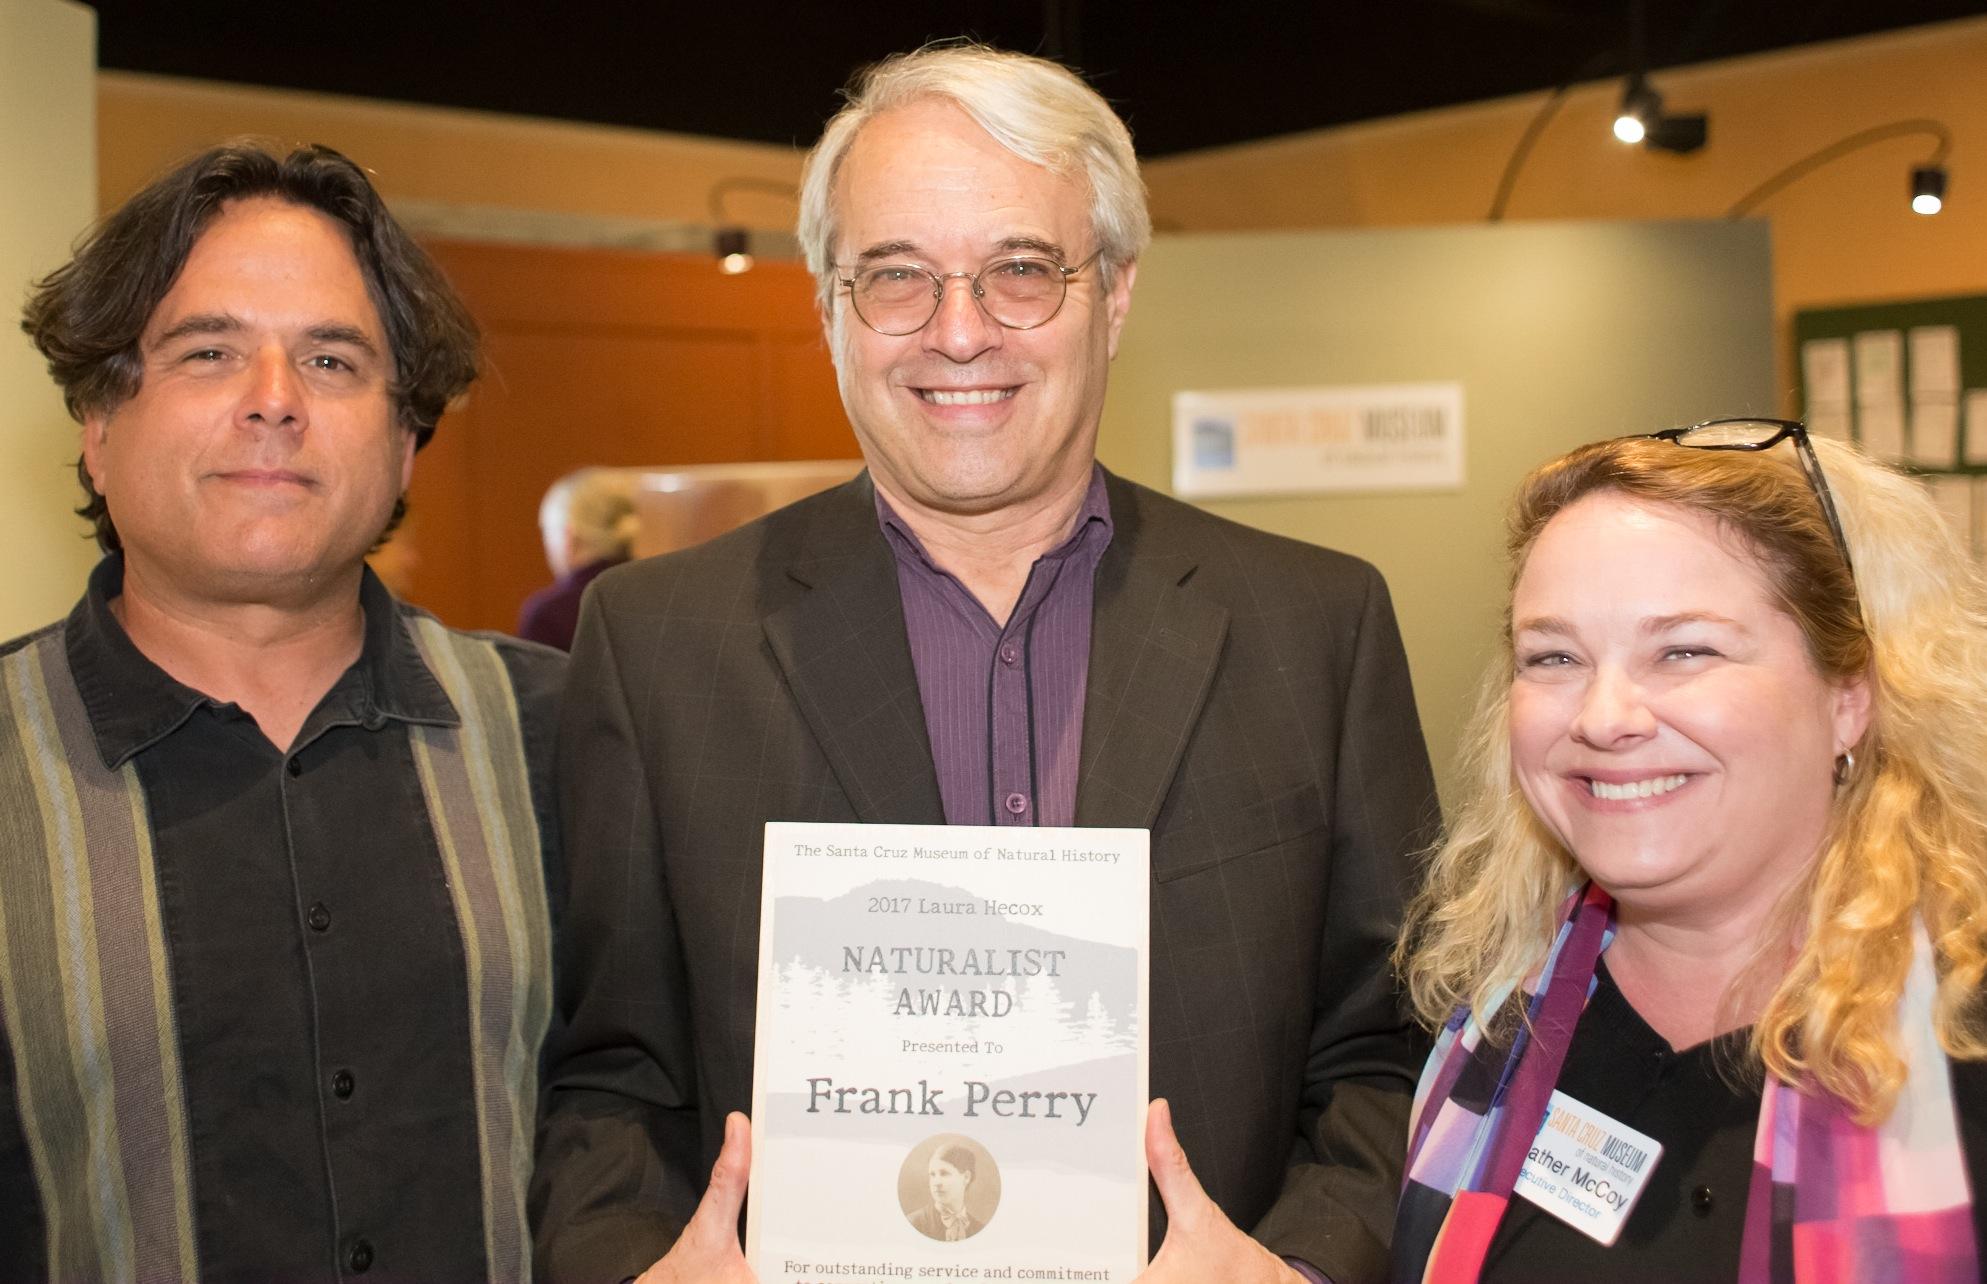 Frank Perry, Laura Hecox Naturalist Award Winner